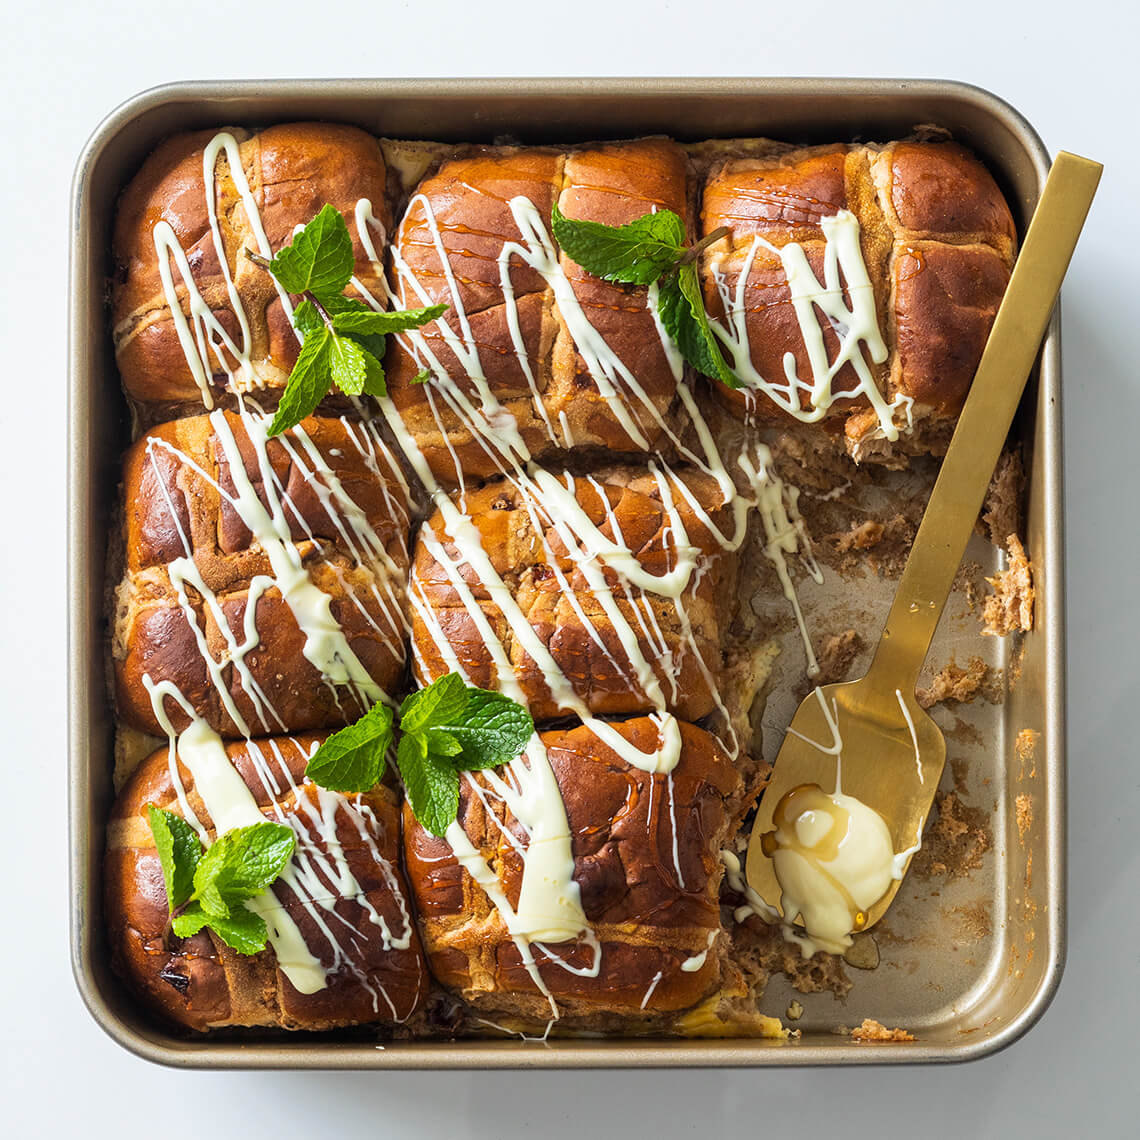 Hot cross bun bread-and-butter pudding